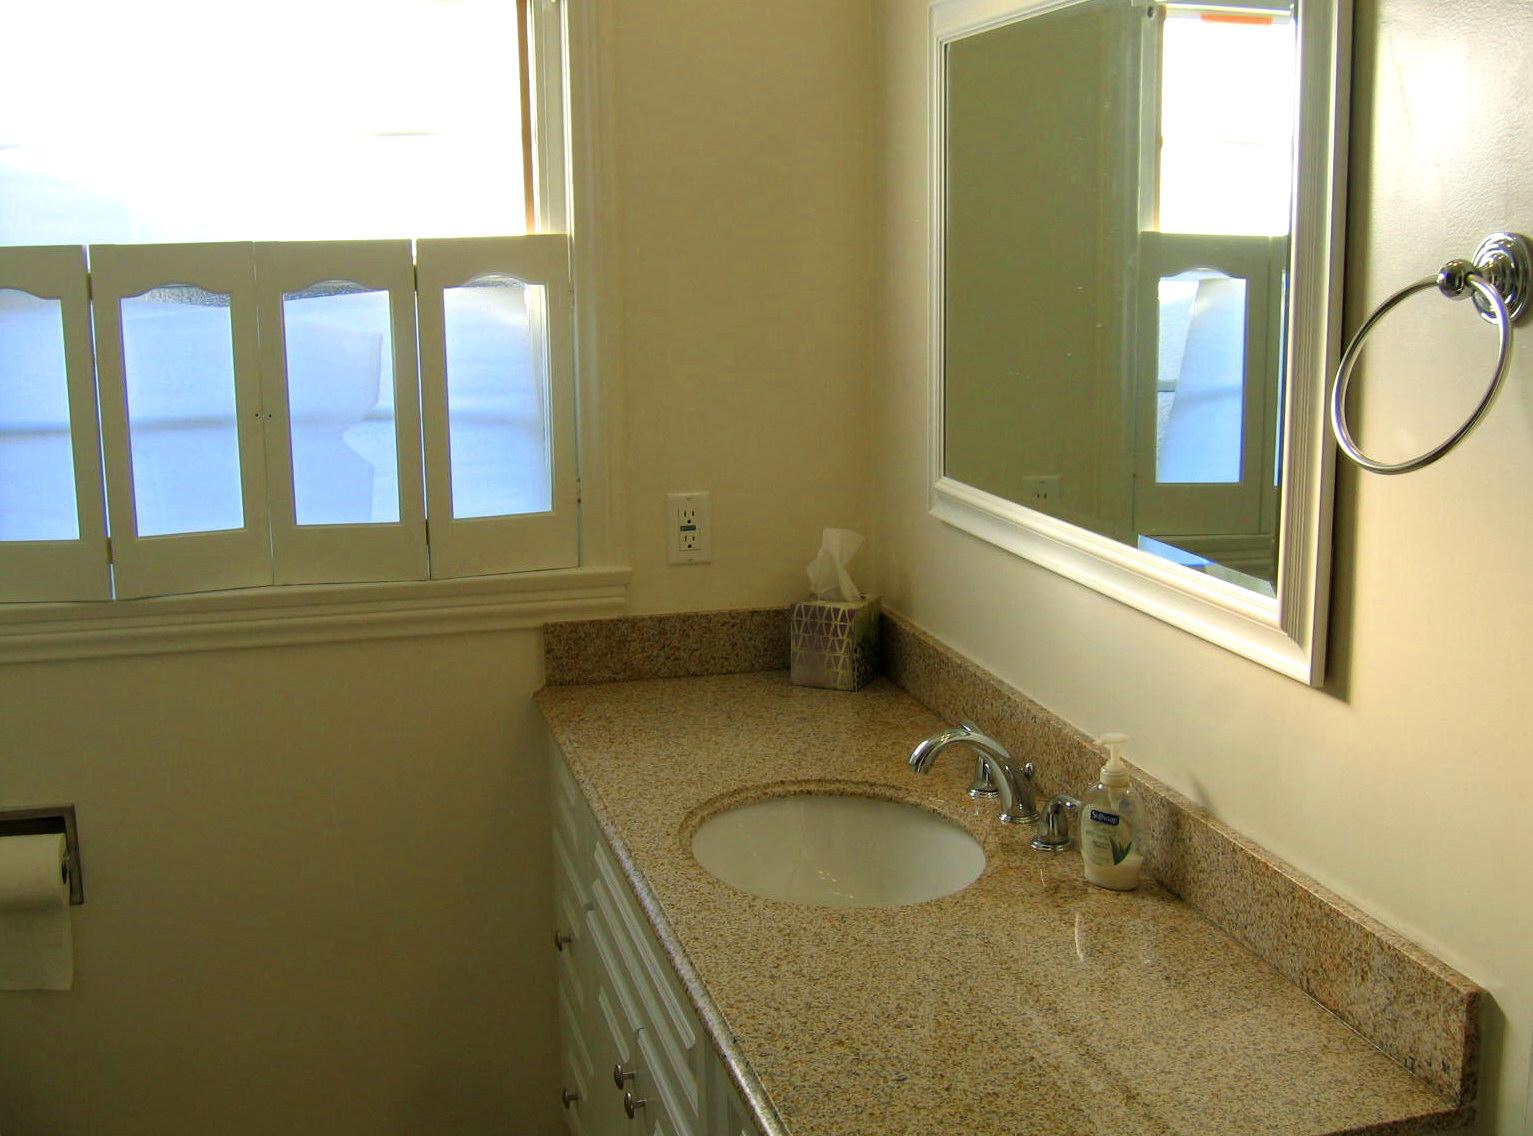 BEAUTIFULLY RESTORED GLENDALE DUPLEX! | Burbank, CA Real Estate ...